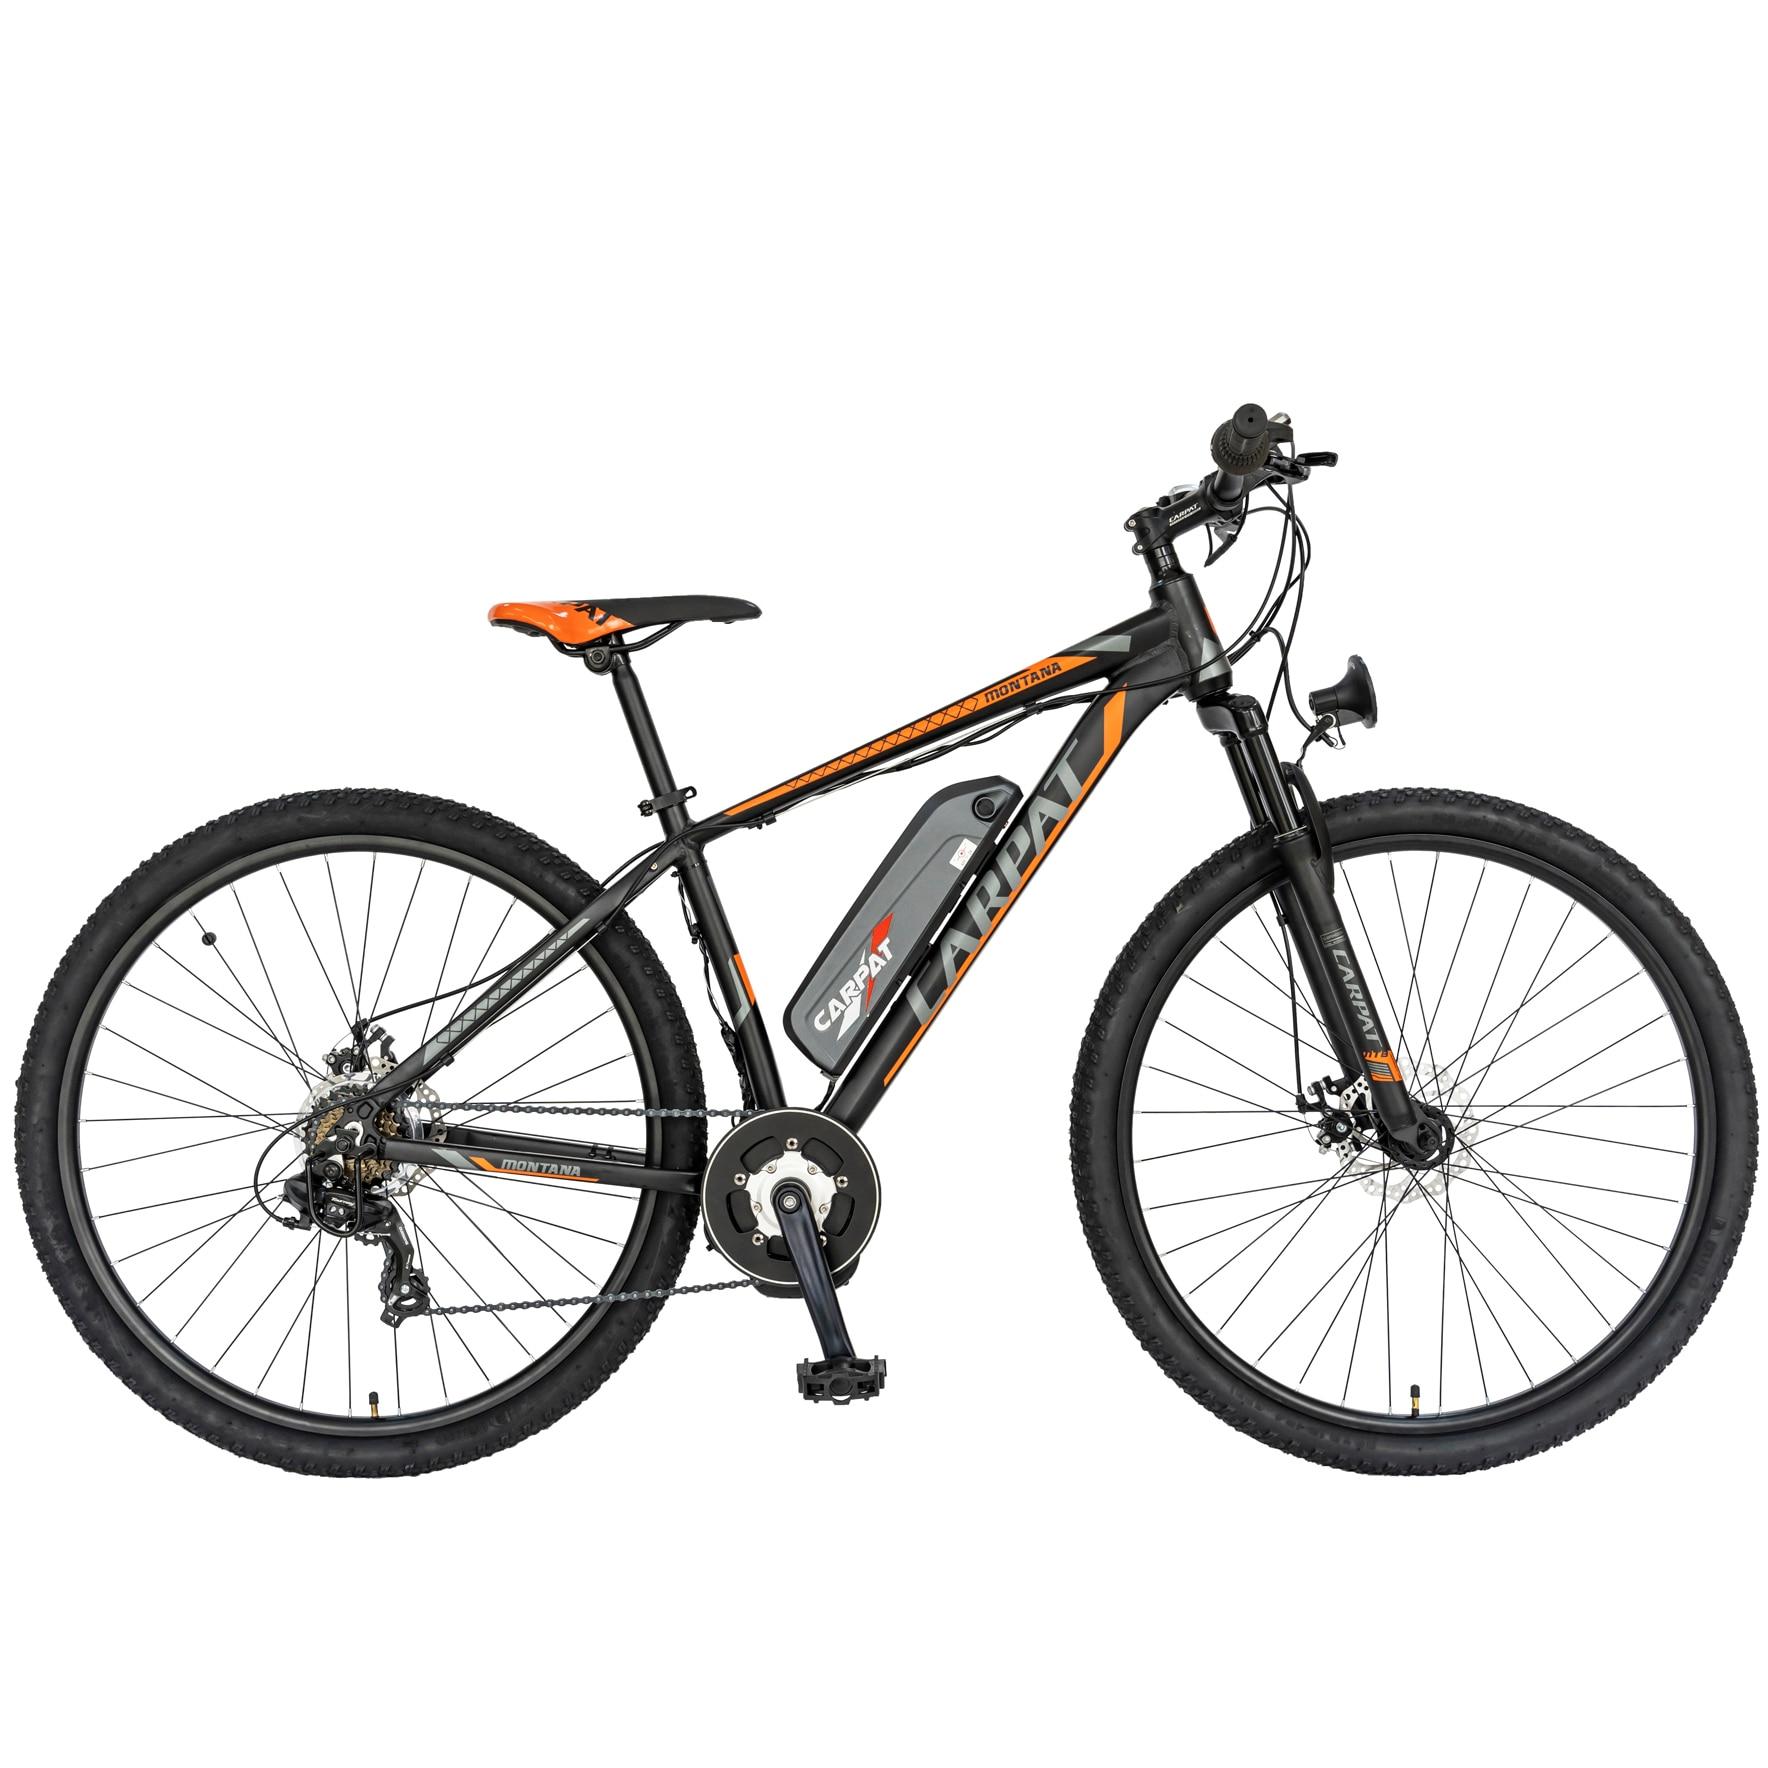 Fotografie Bicicleta MTB Electric Carpat C2999E, Negru/Portocaliu